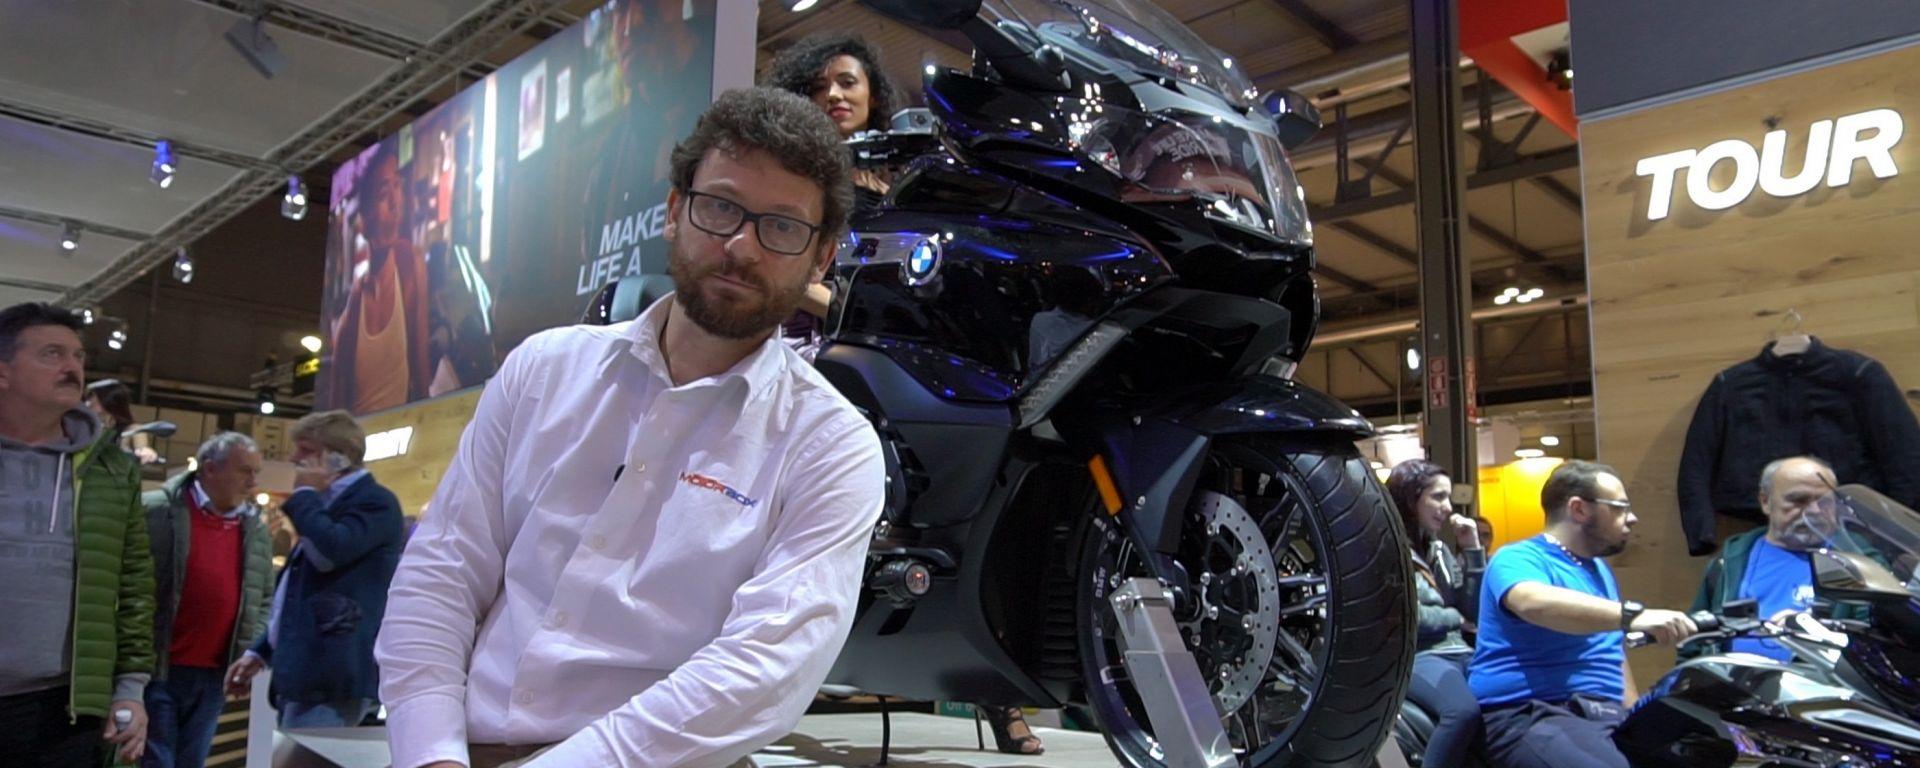 BMW K 1600 Grand America: a EICMA la nuova supertourer [VIDEO]